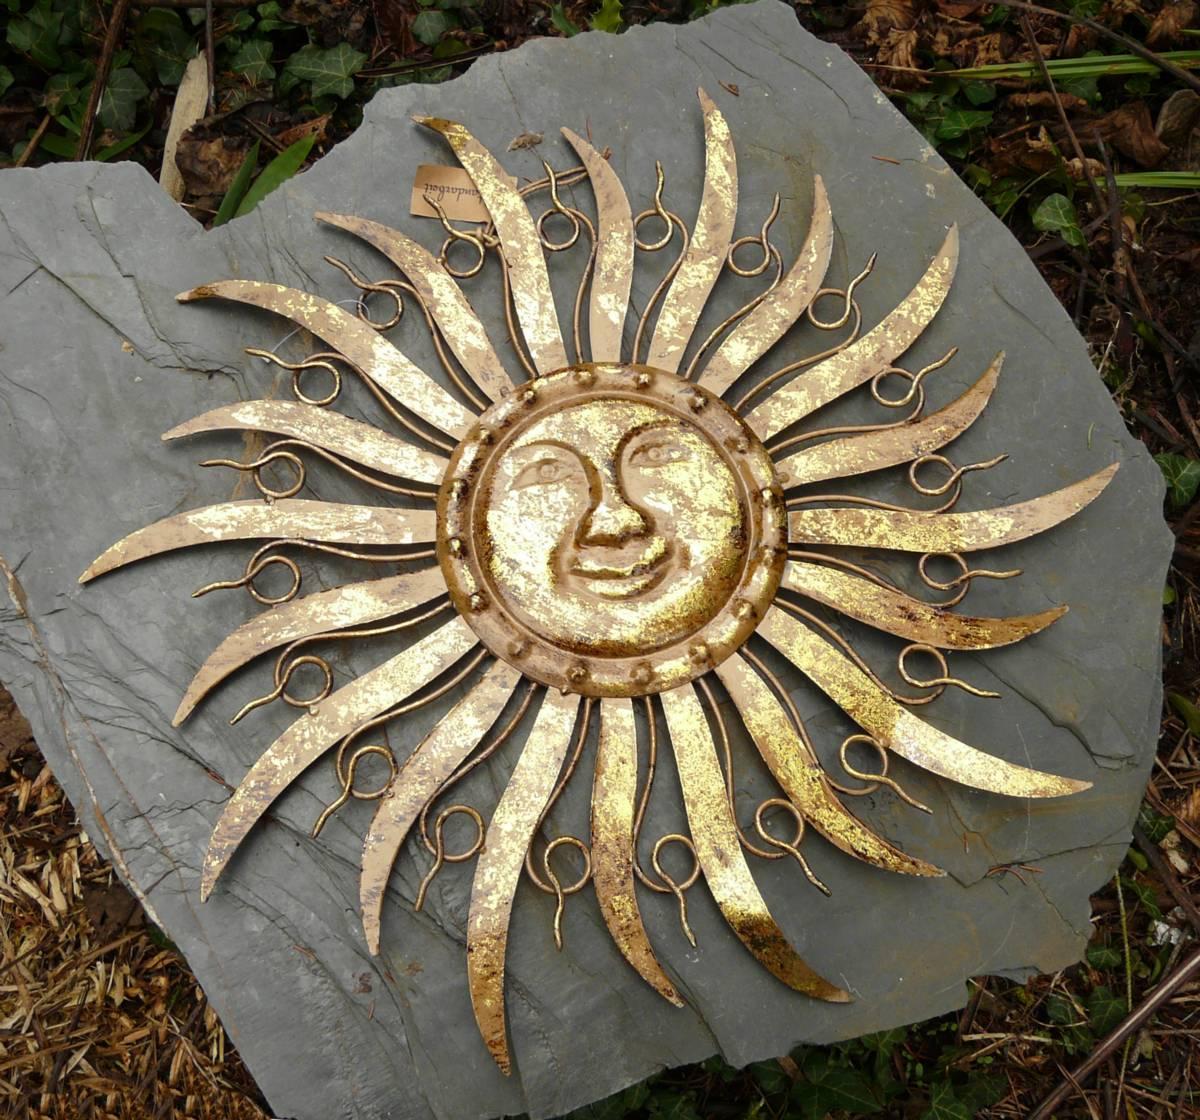 Sonne metall braun gold wanddekoration wandbild gartendeko for Gartendeko metall